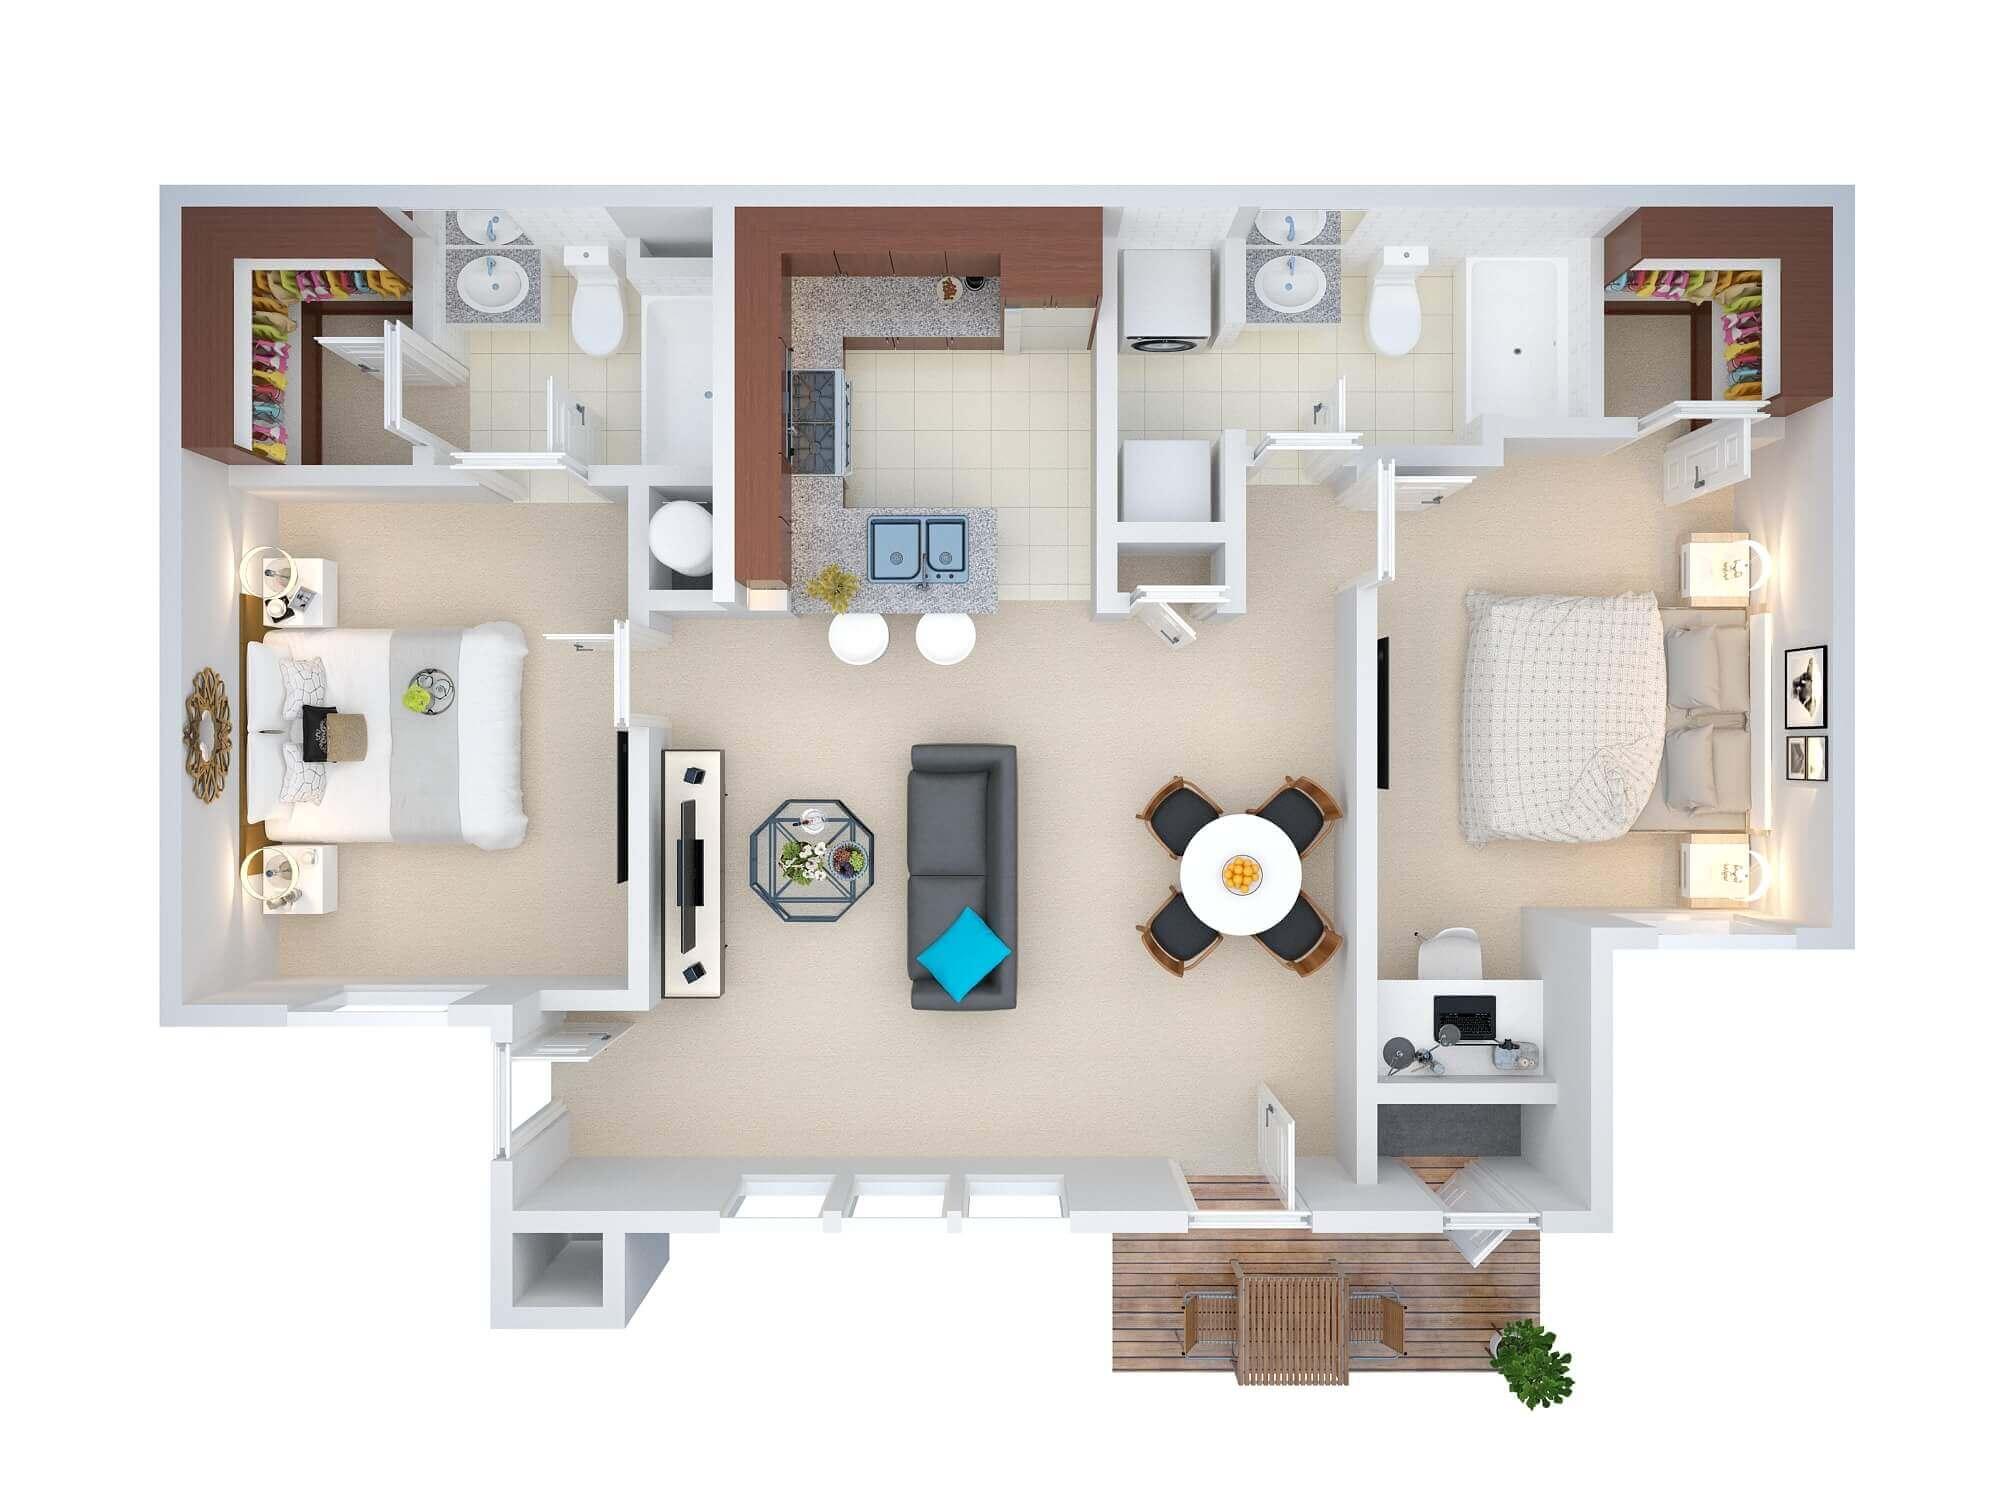 Real Estate 3D Floor Plans – Design / Rendering – Samples / Examples ...